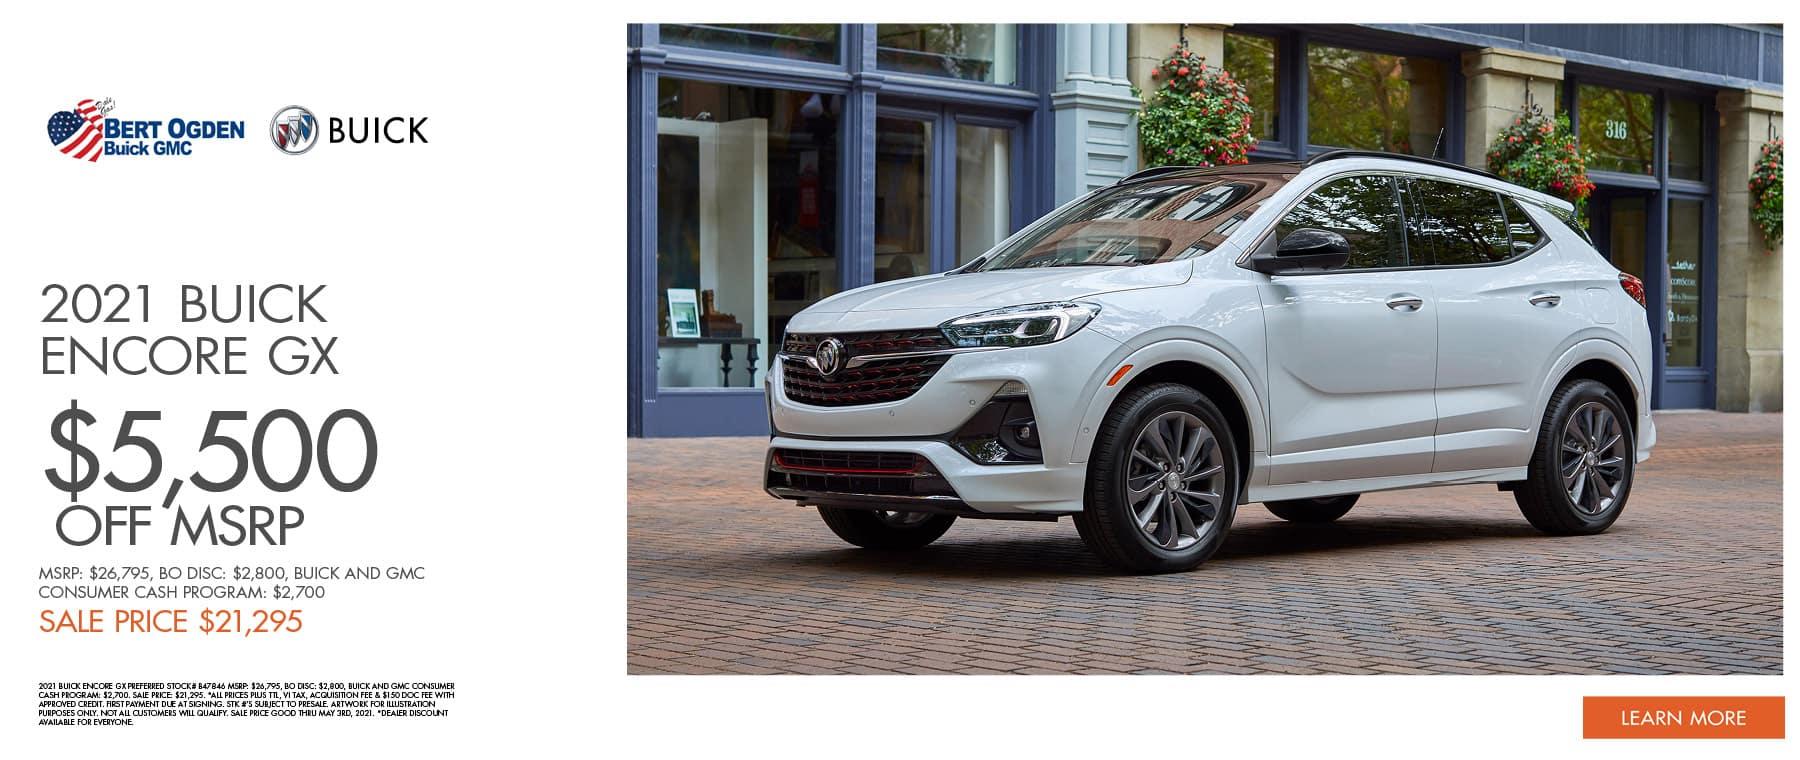 2021 Buick Encore GX | Bert Ogden Buick GMC | Edinburg, TX